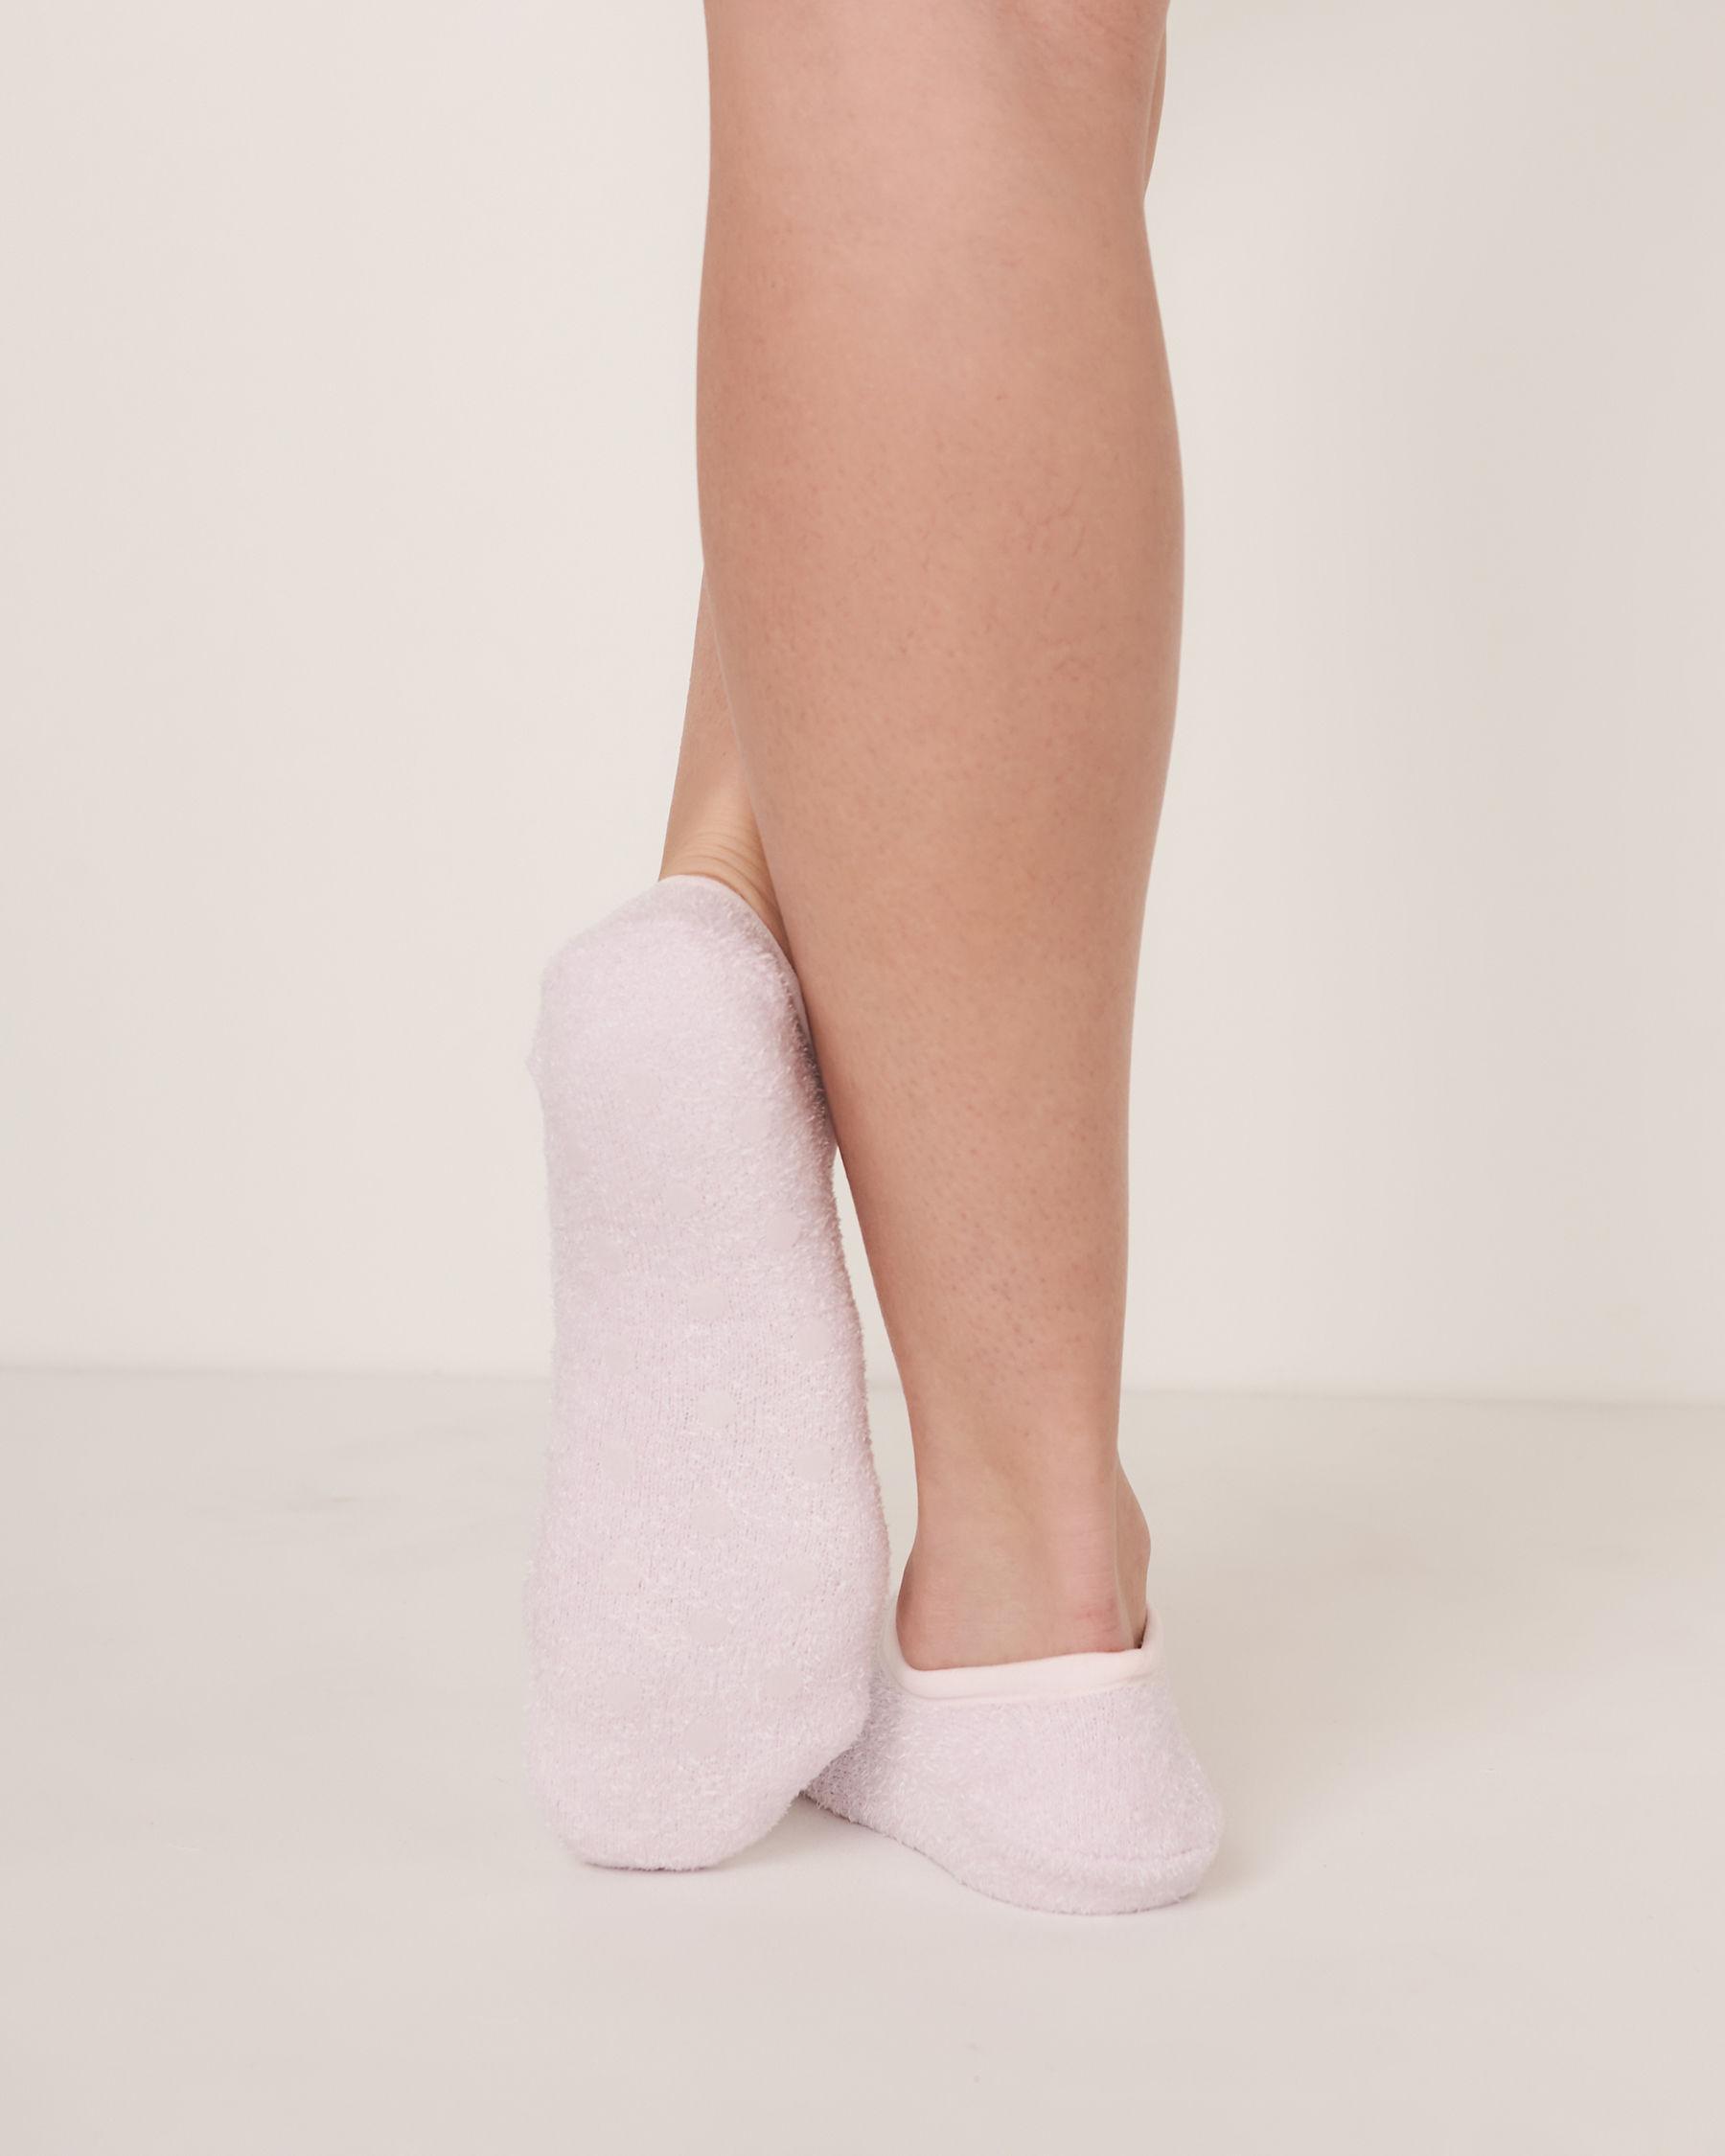 LA VIE EN ROSE Chenille Slipper Socks Lilac 40700015 - View2